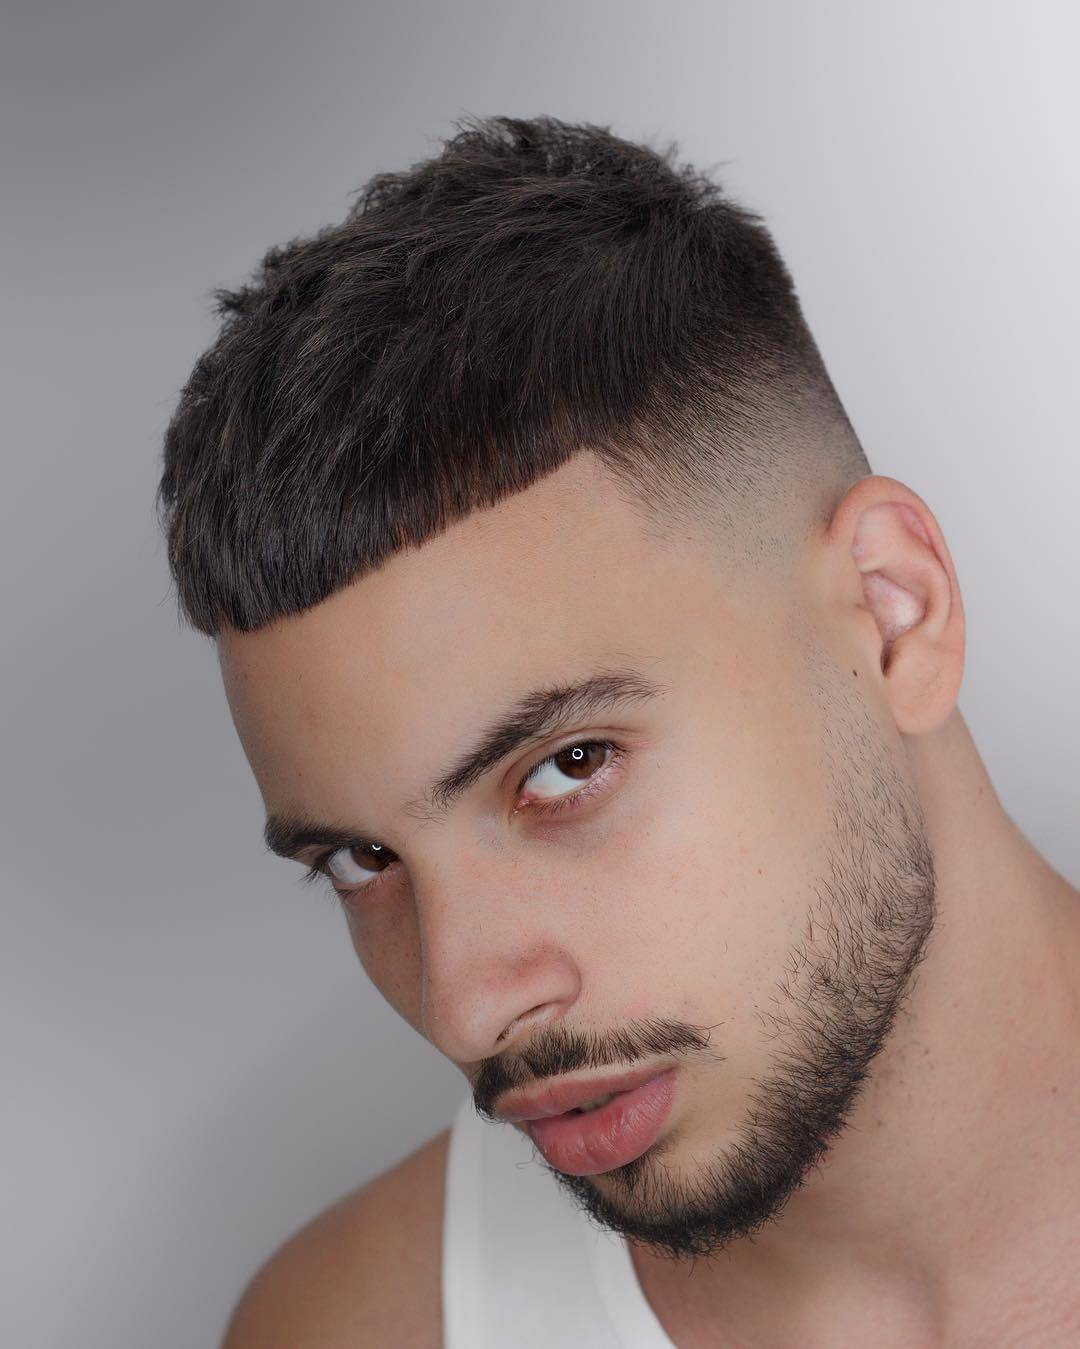 Skin fade French crop hair cut